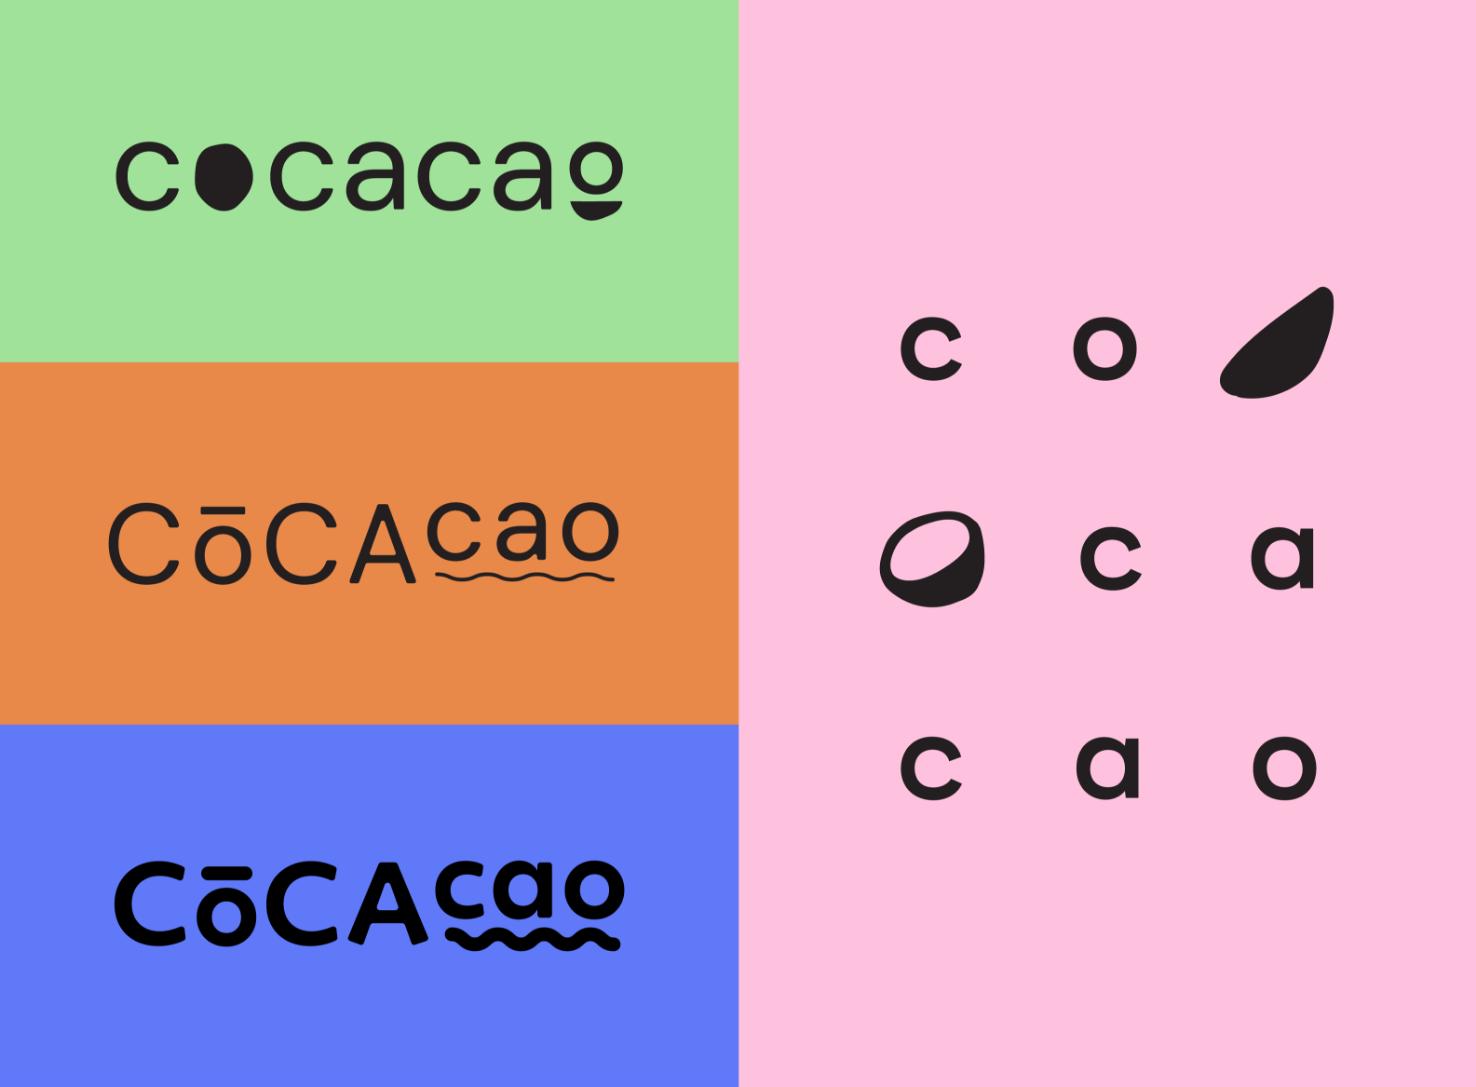 Un-used logo ideas